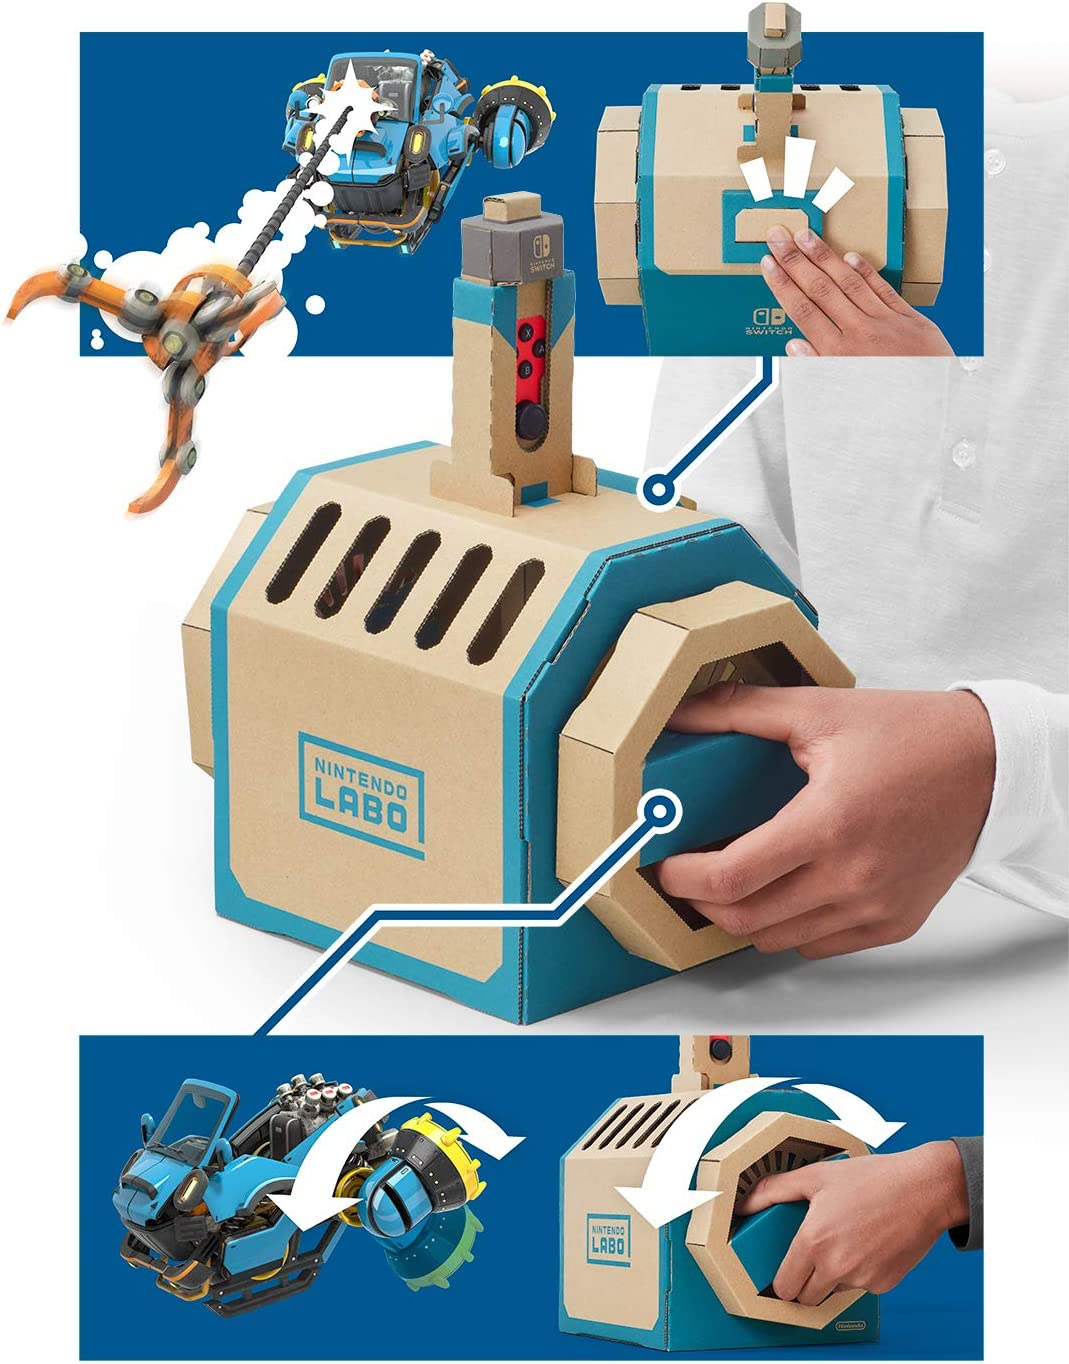 Nintendo Labo (ニンテンドー ラボ) Toy-Con 03: Drive Kit - Switch (【Amazon.co.jp限定】オリジナルマスキングテープ+Nintendo Labo免許証風カード 同梱): Amazon.es: Videojuegos